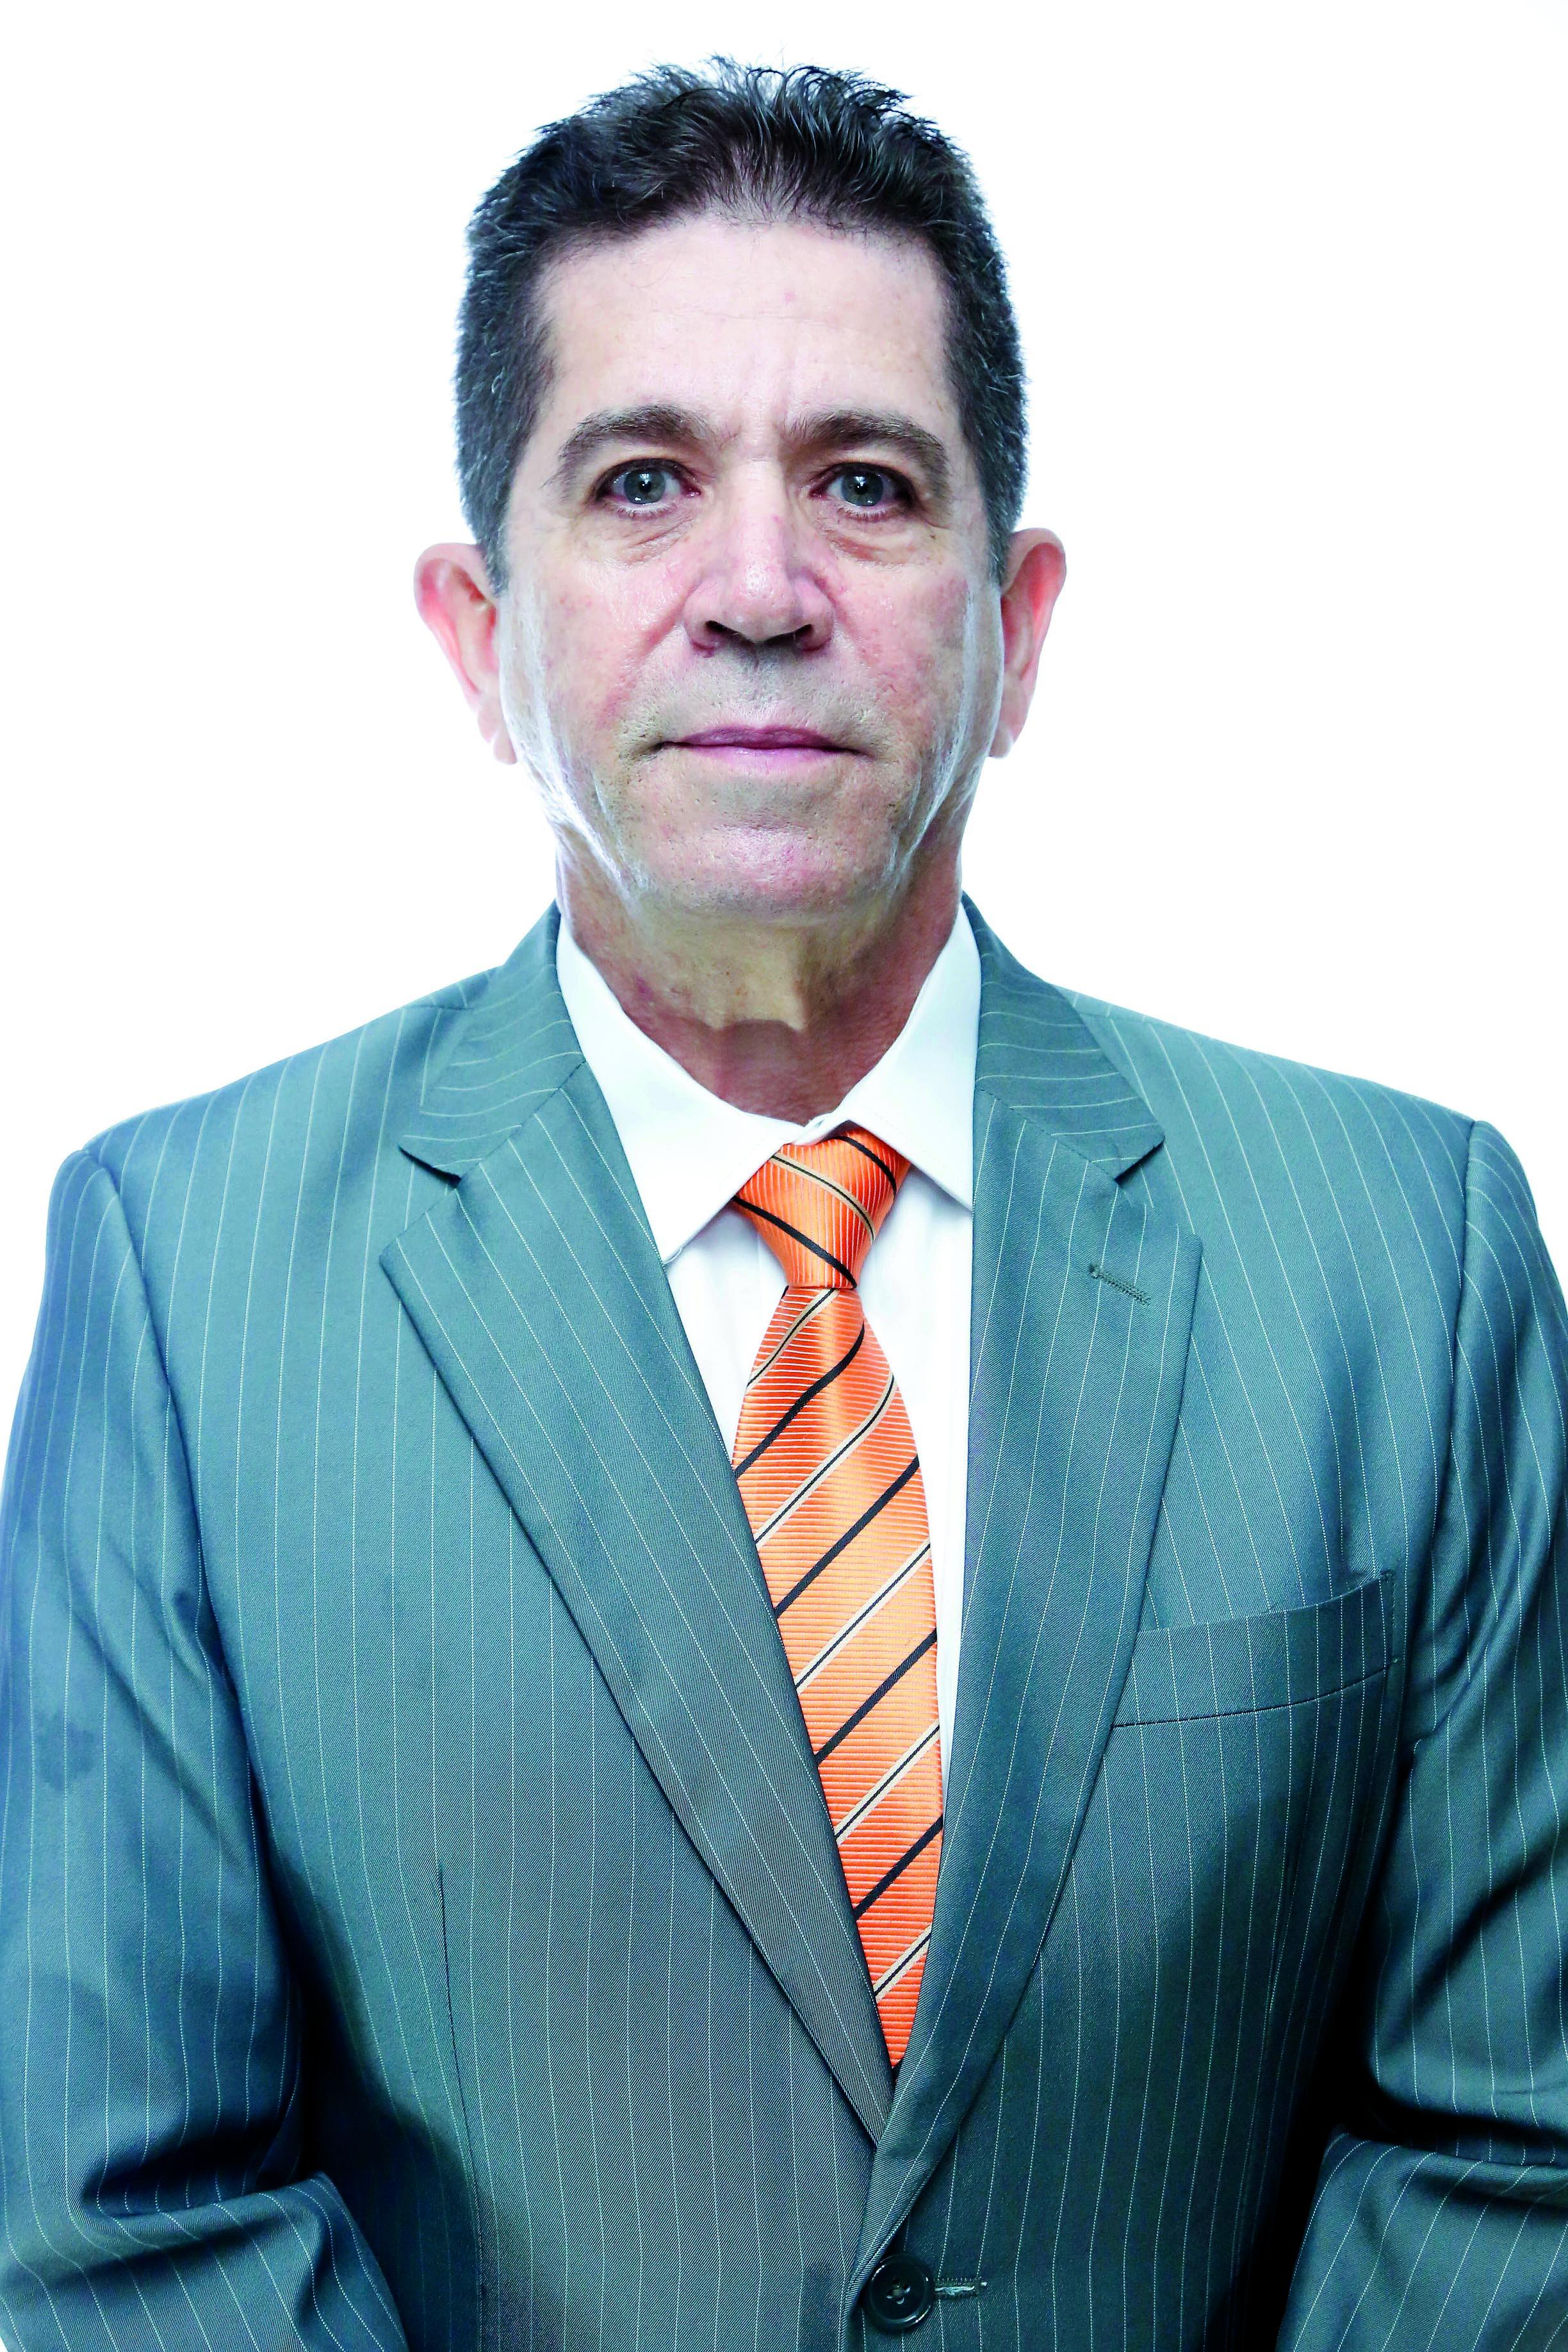 Cel. Antônio Carlos Passos da Silva